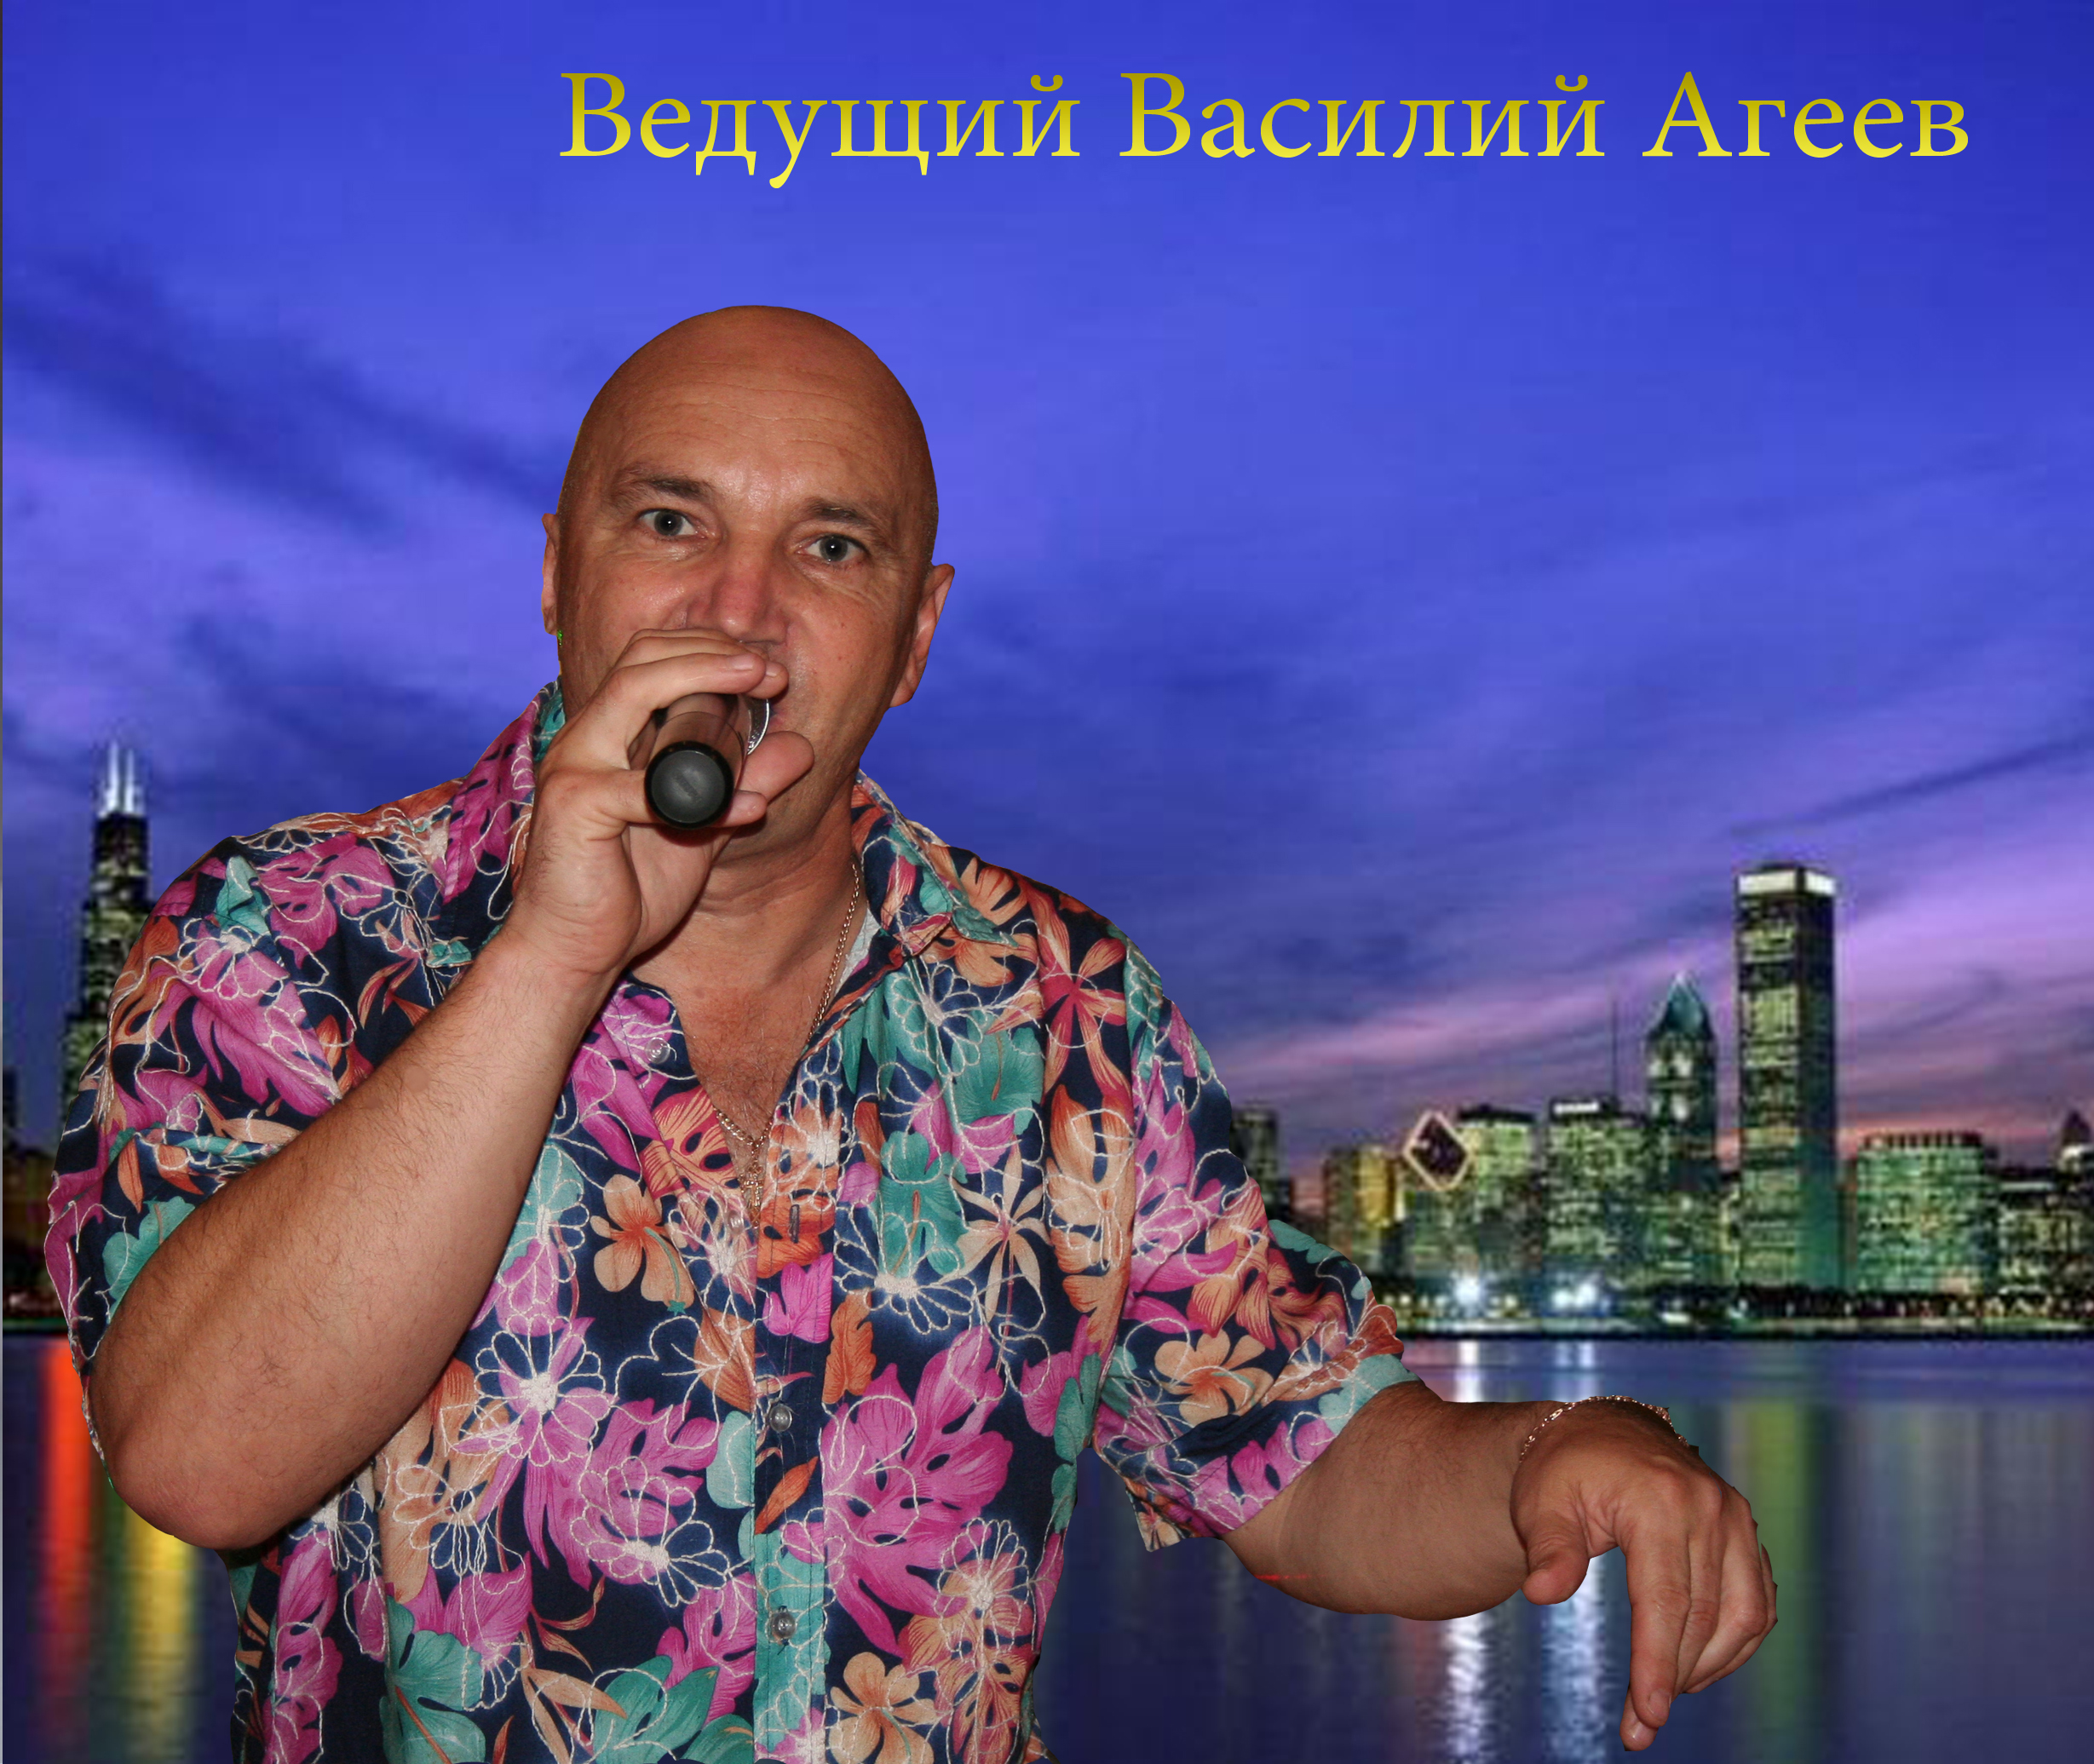 Василий Агеев